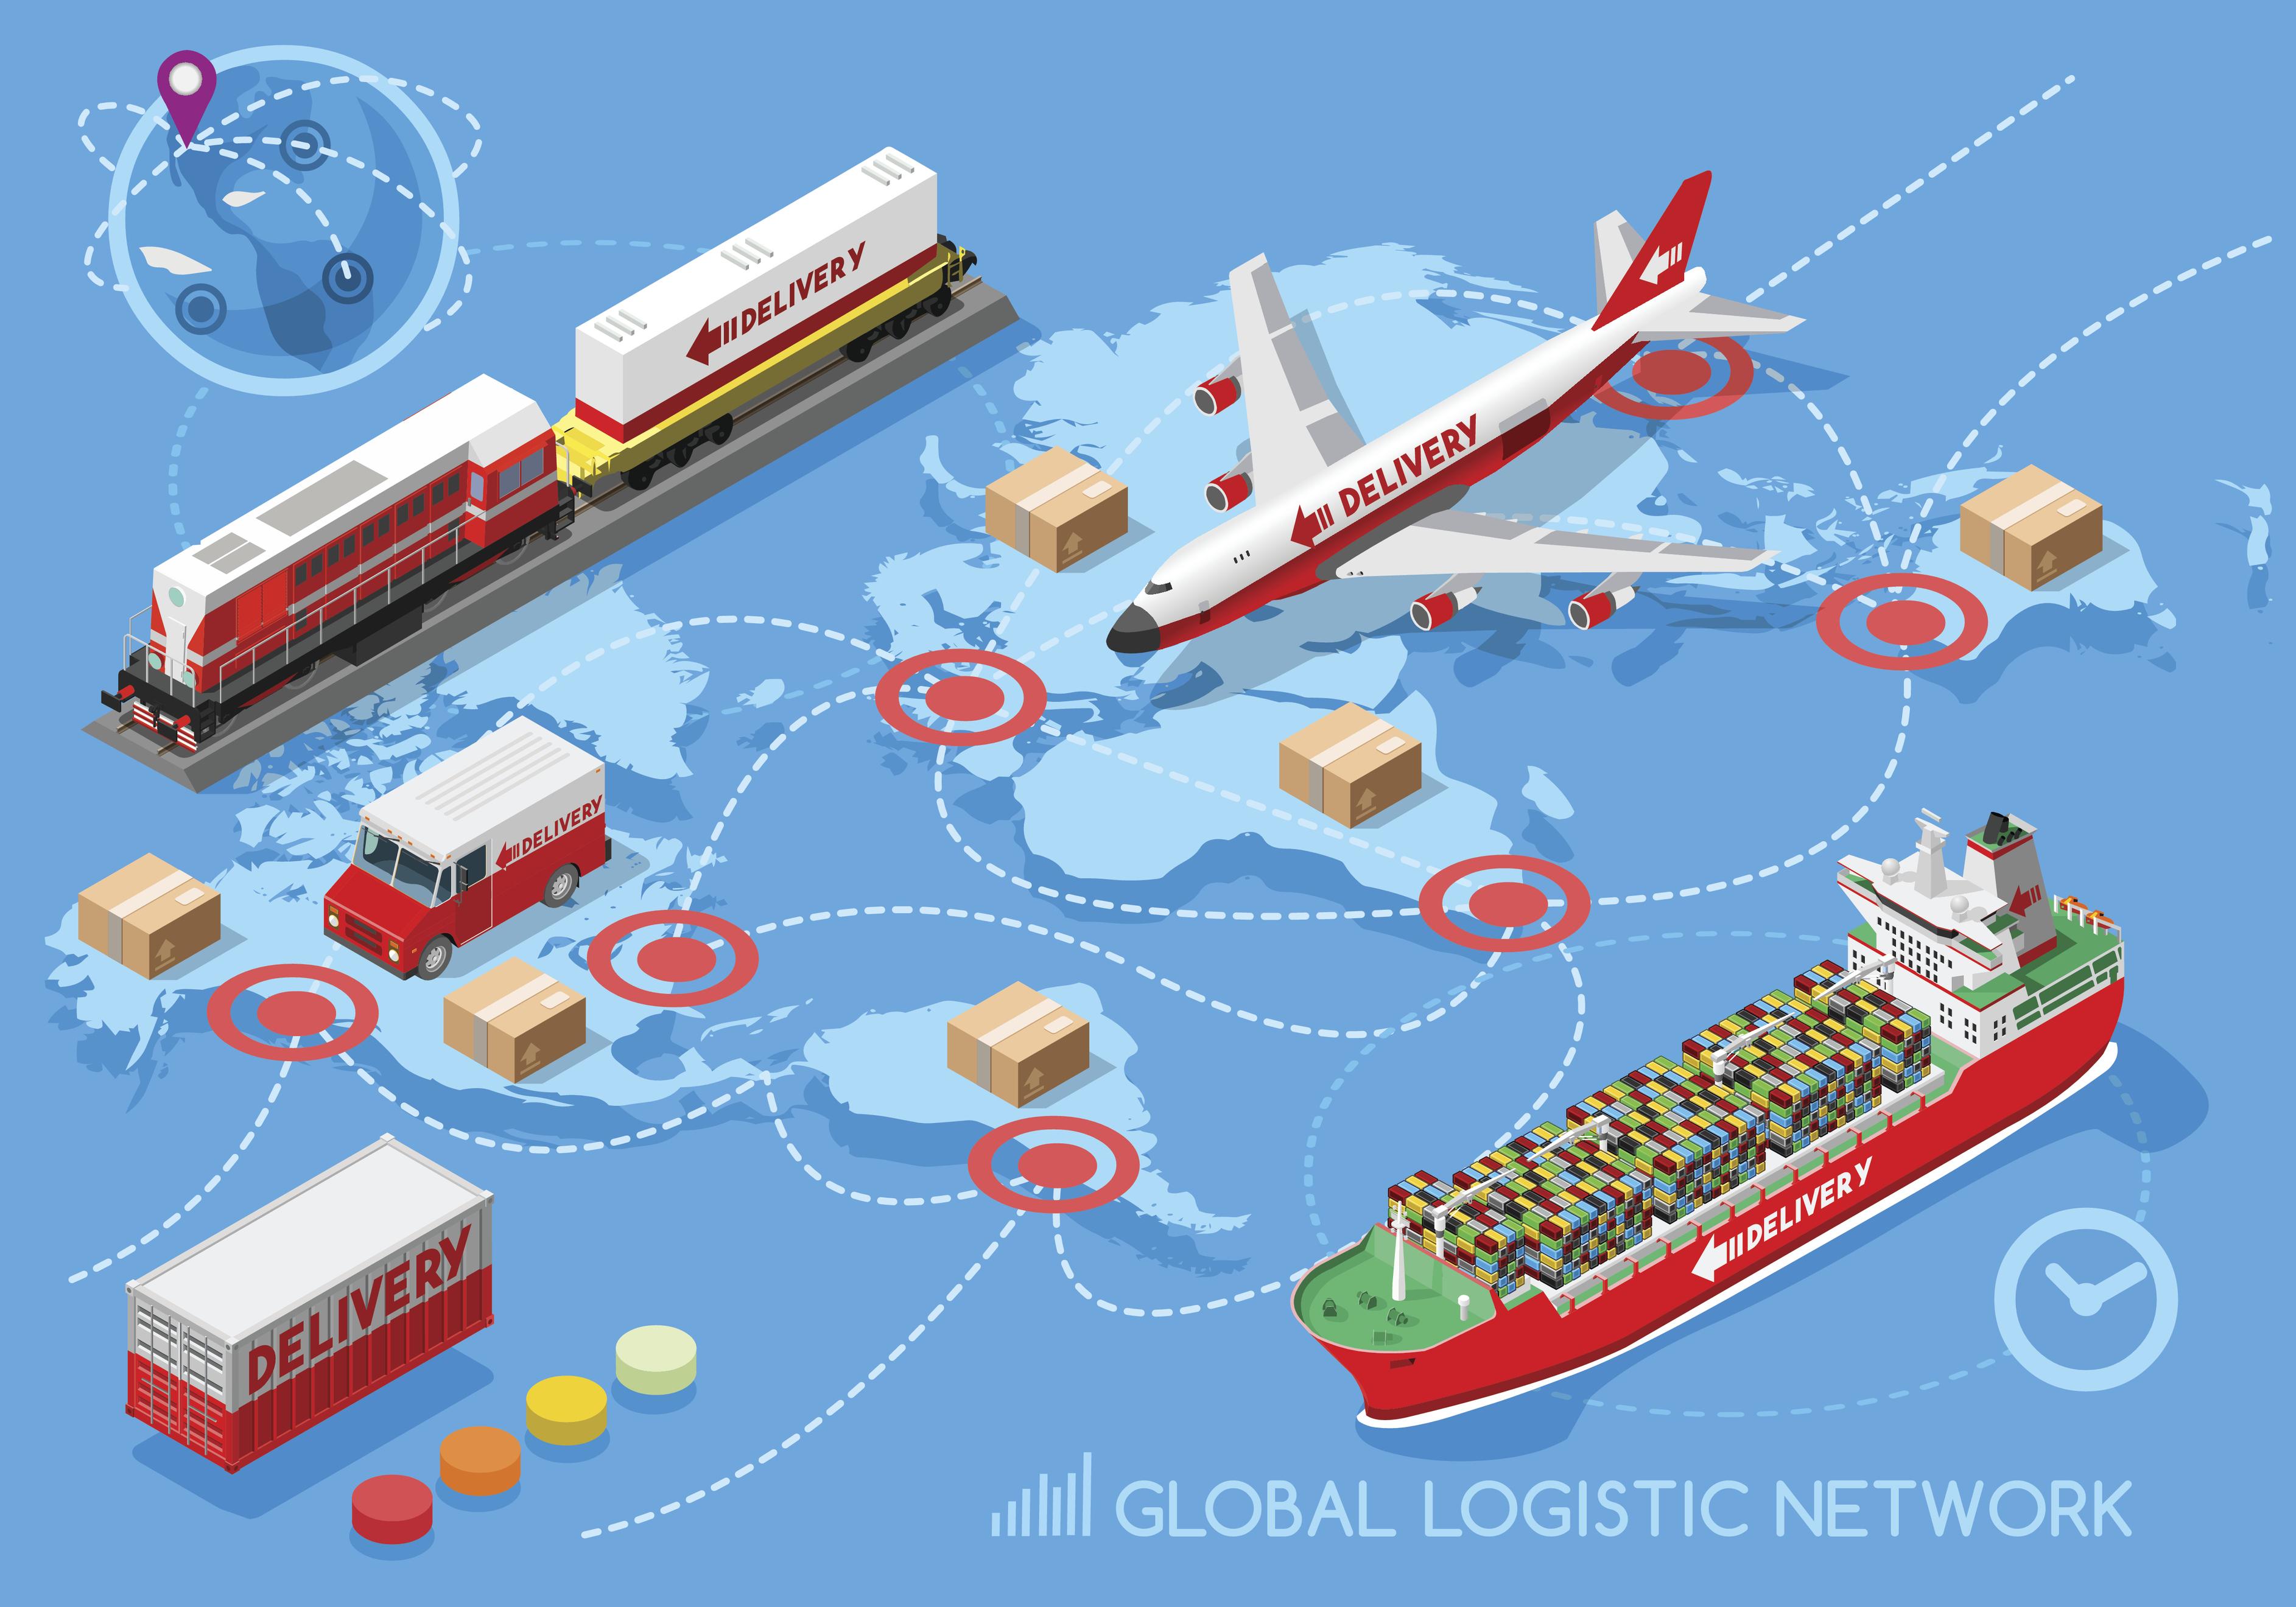 Go Global Webinar: Learn How to Reach New Markets Overseas